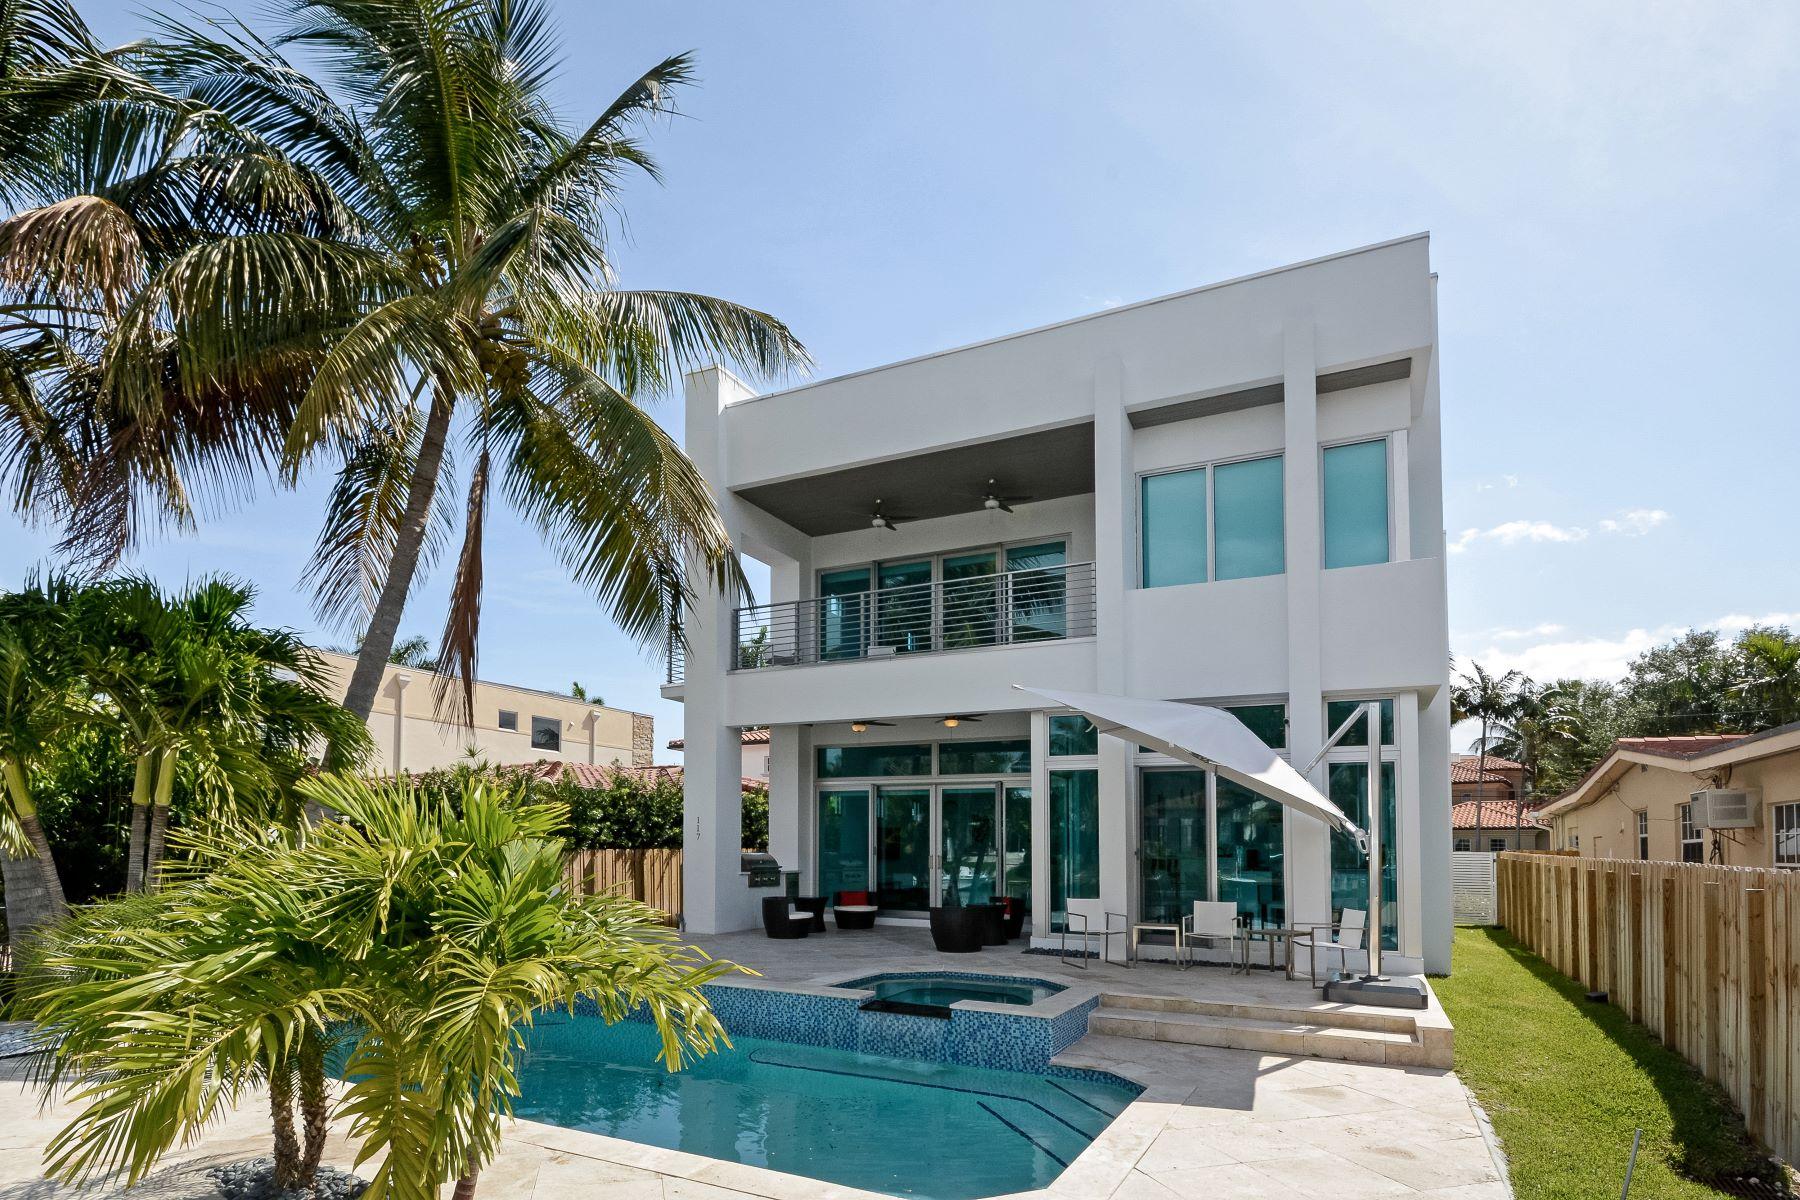 Casa Unifamiliar por un Alquiler en 117 S Gordon Rd 117 SGordon Rd Fort Lauderdale, Florida 33301 Estados Unidos